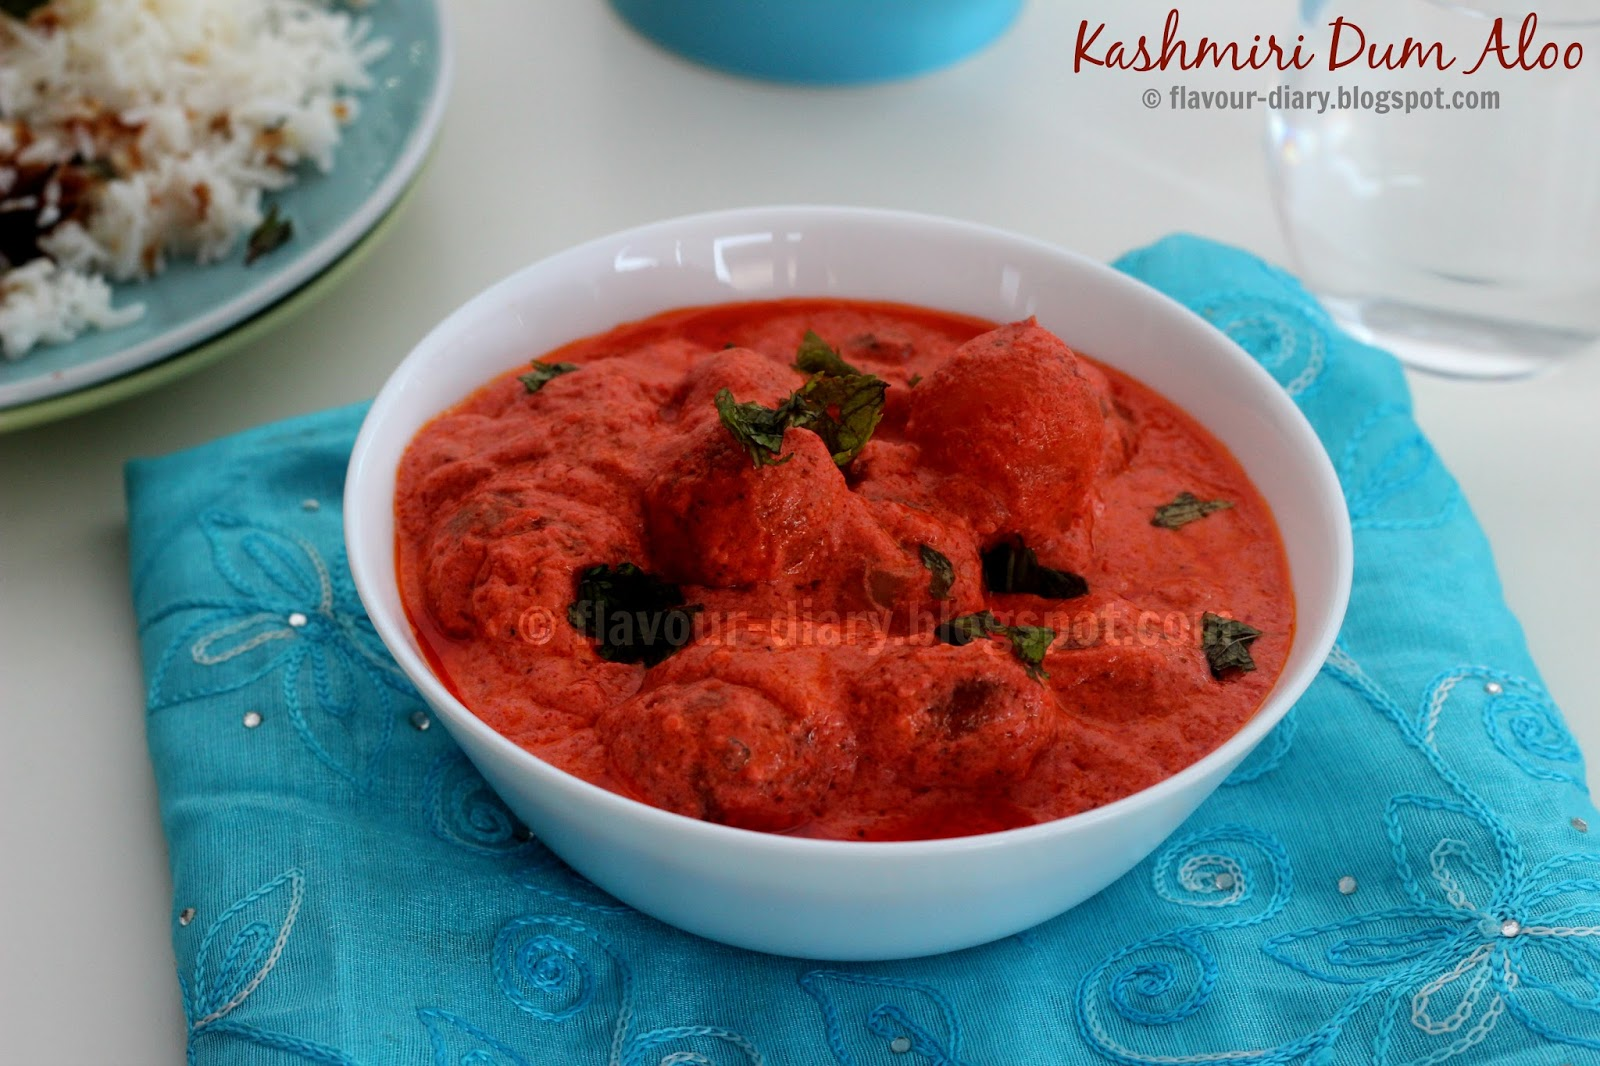 dum aloo kashmiri cuisine flavourdiary